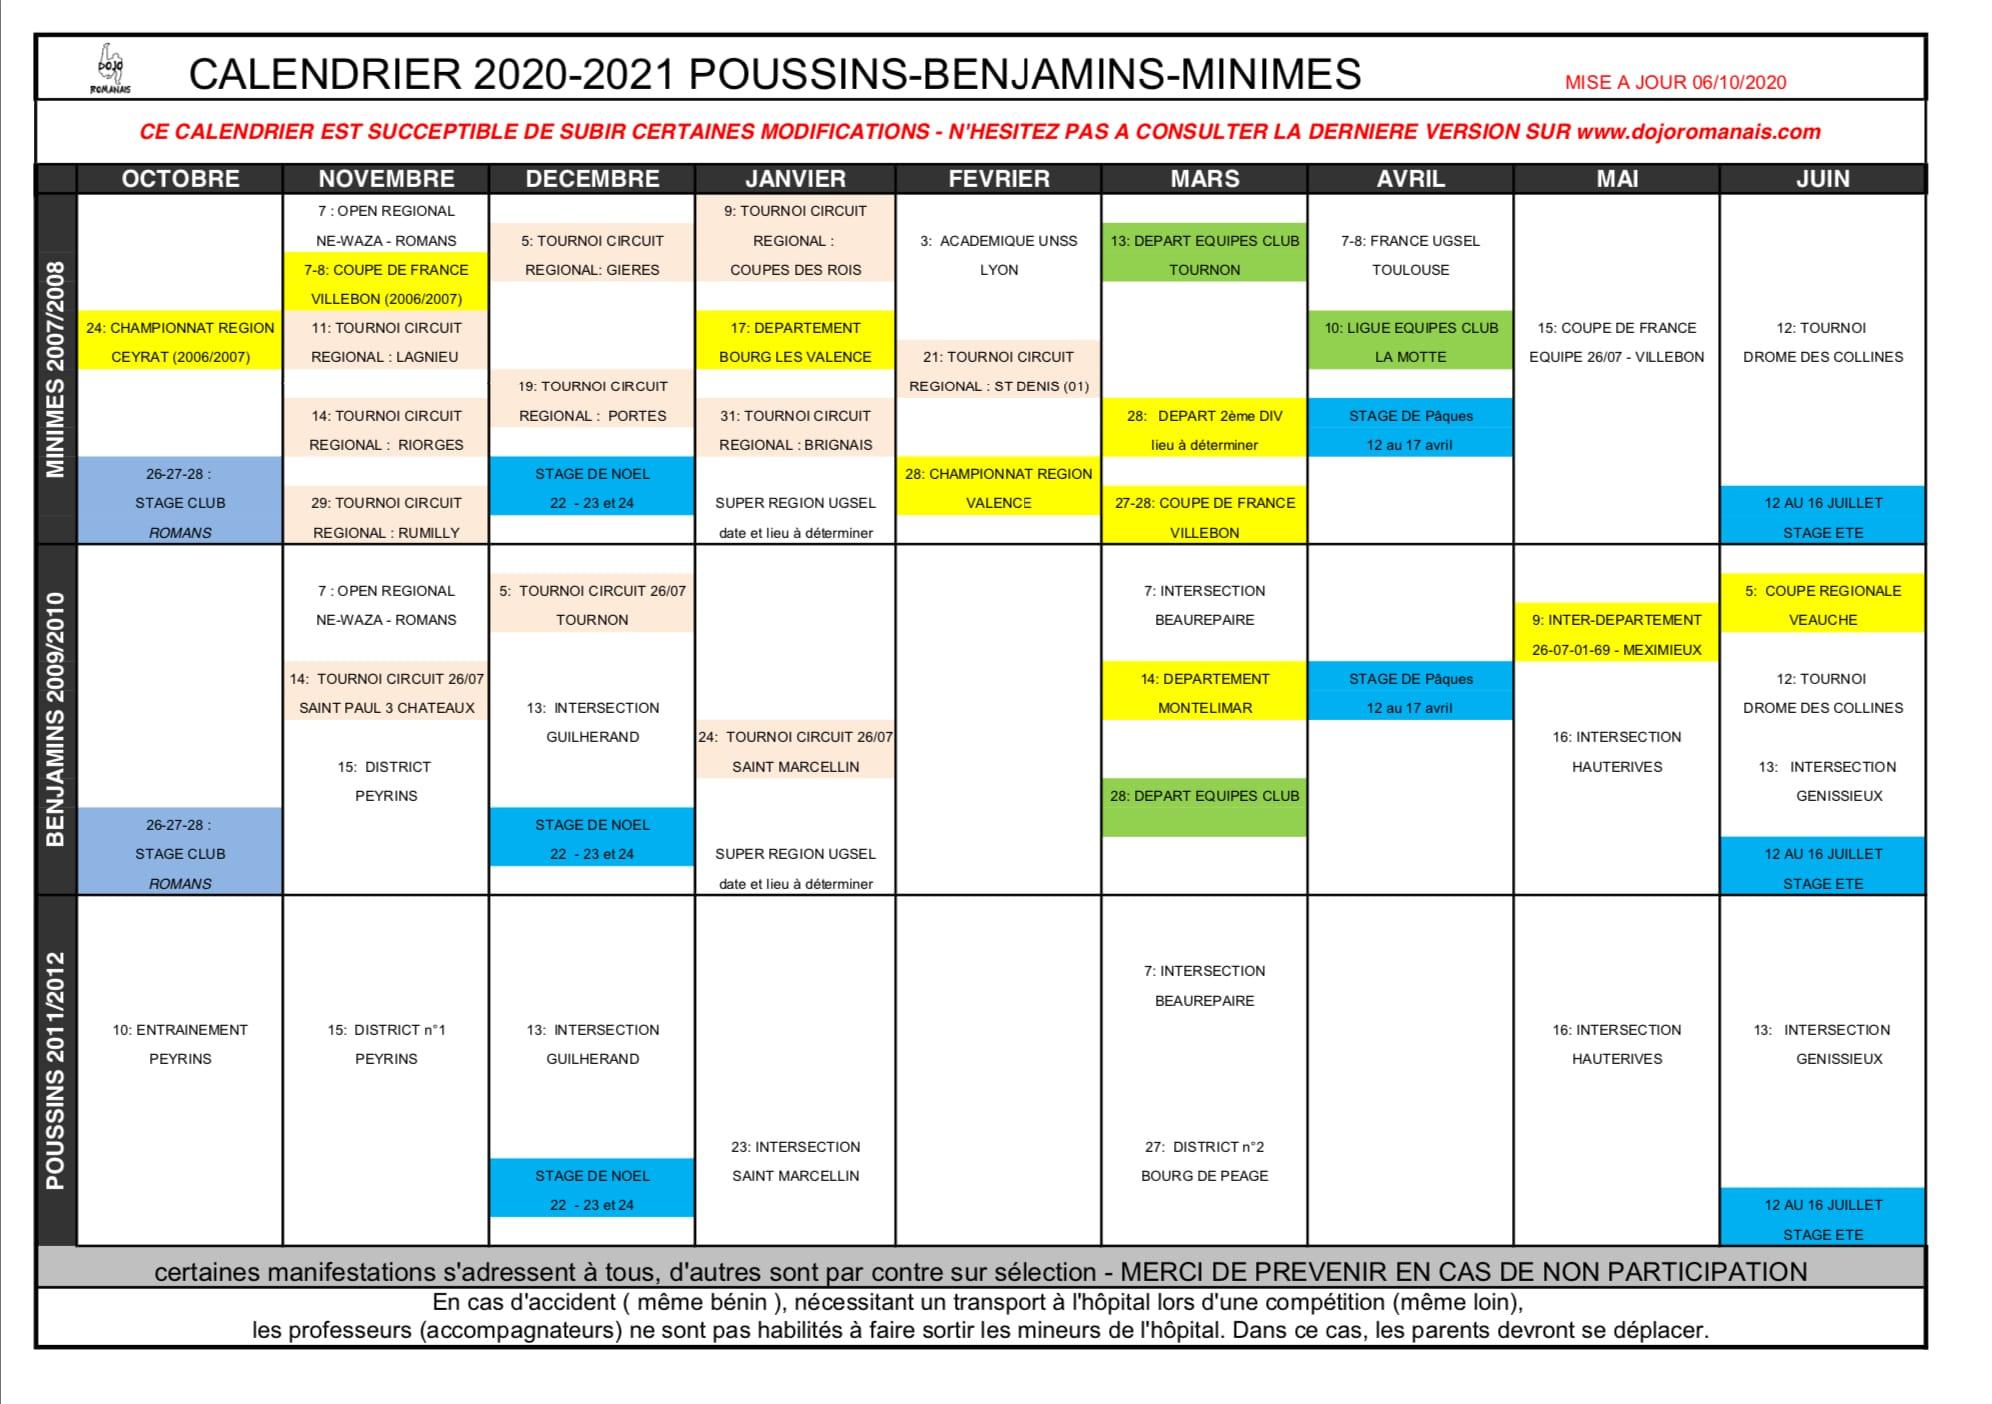 Calendrier poussins minimes benjamins 2020 21